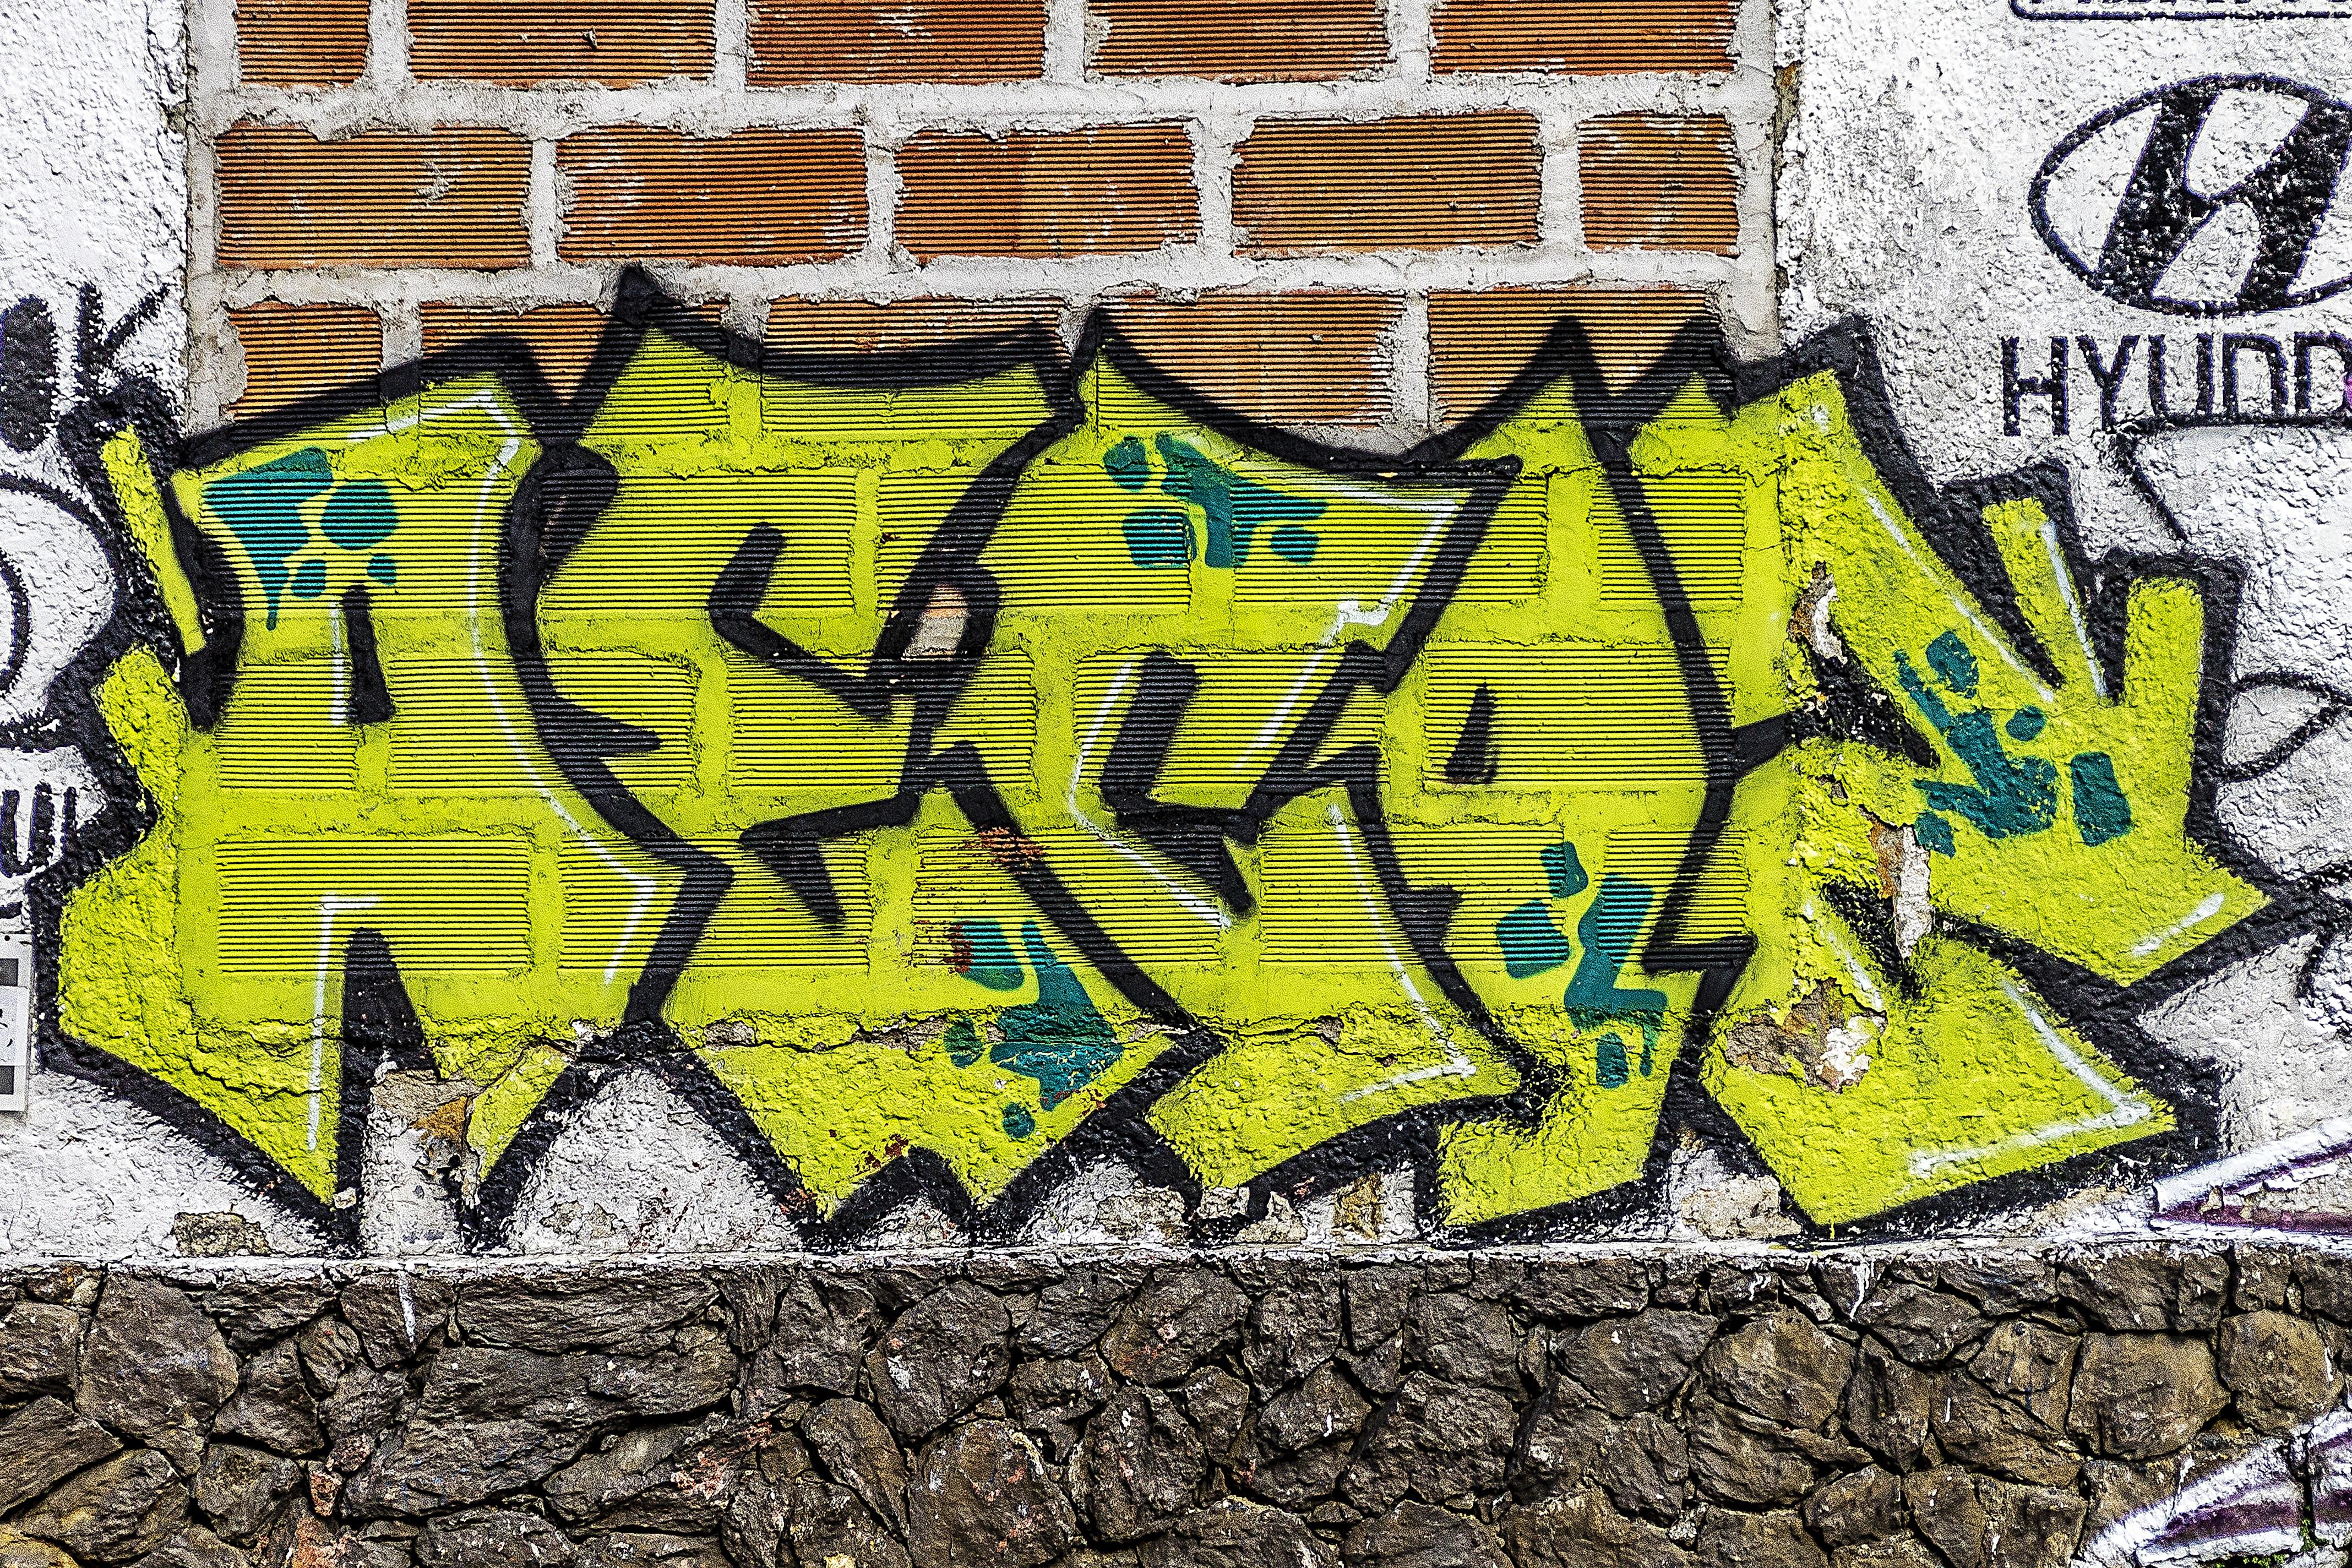 Free Images City Artistic Grunge Brick Wall Street Art